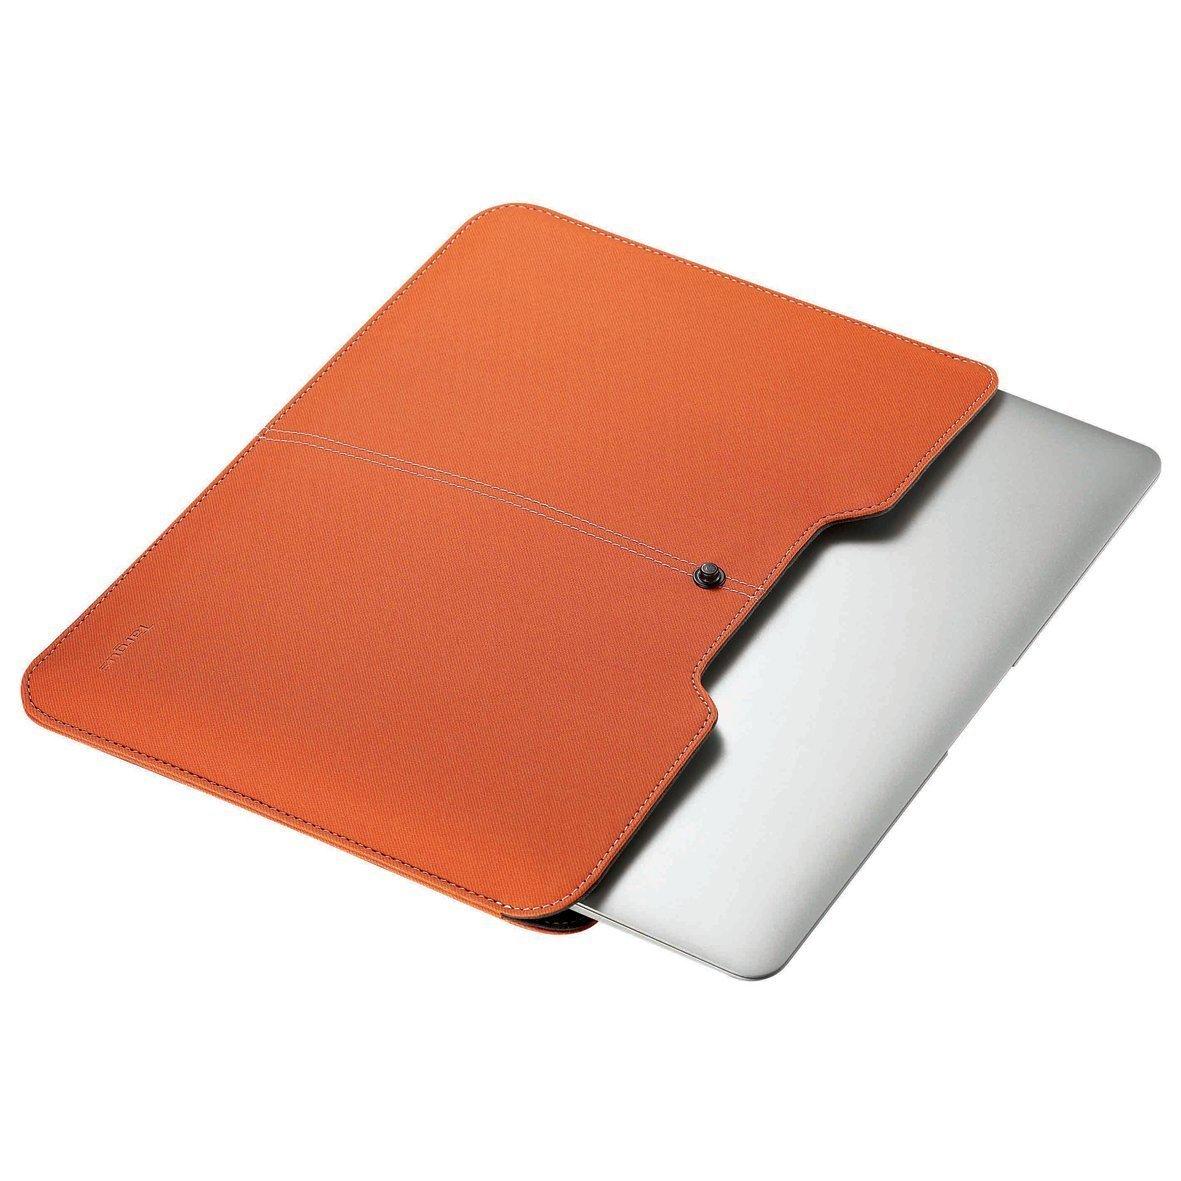 targus laptop sleeve notebook carry case for 13 macbook. Black Bedroom Furniture Sets. Home Design Ideas